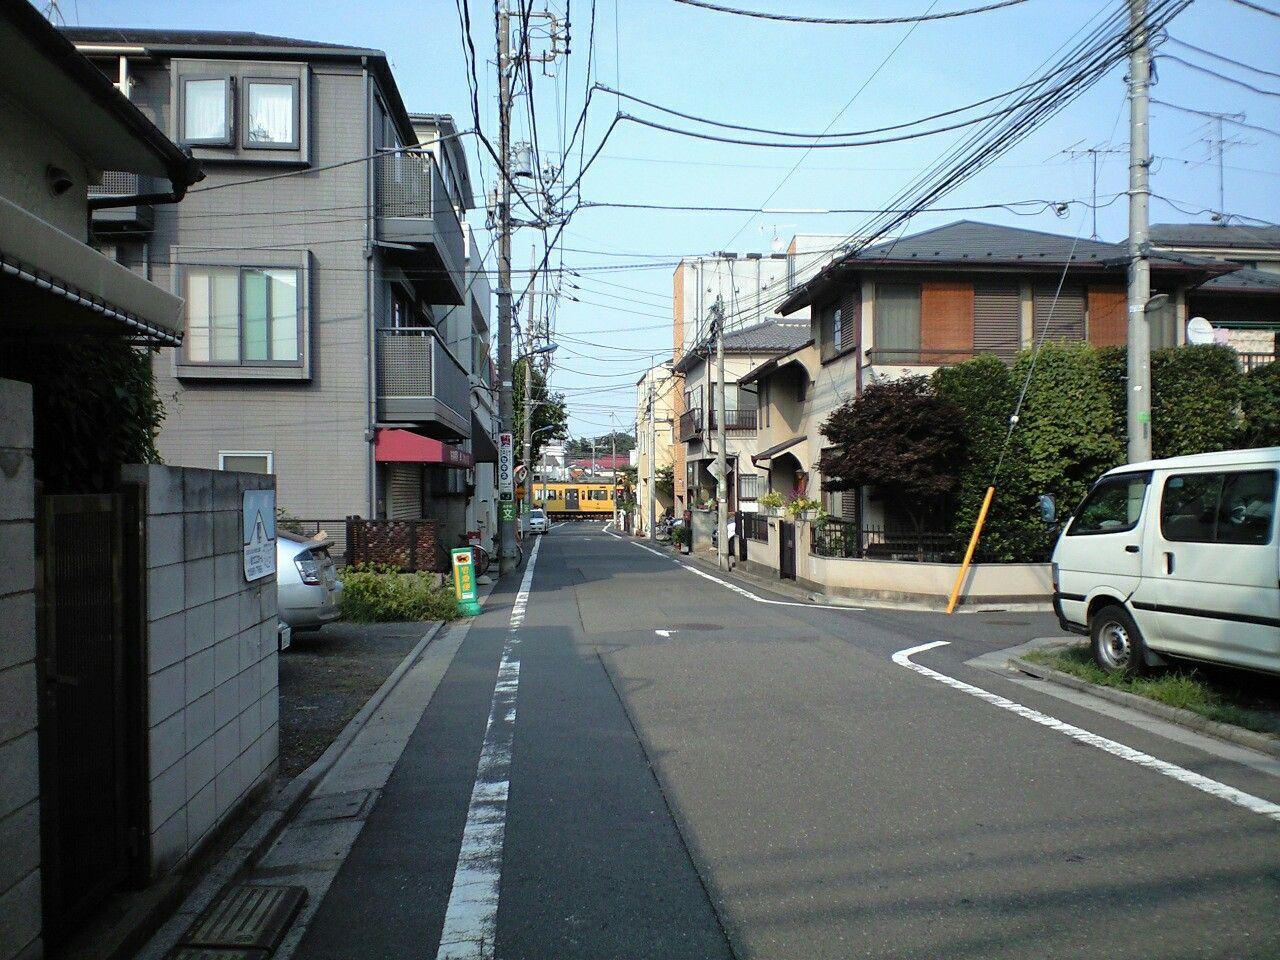 Pin by 929210976 on Casa japonesas City, Street, Views